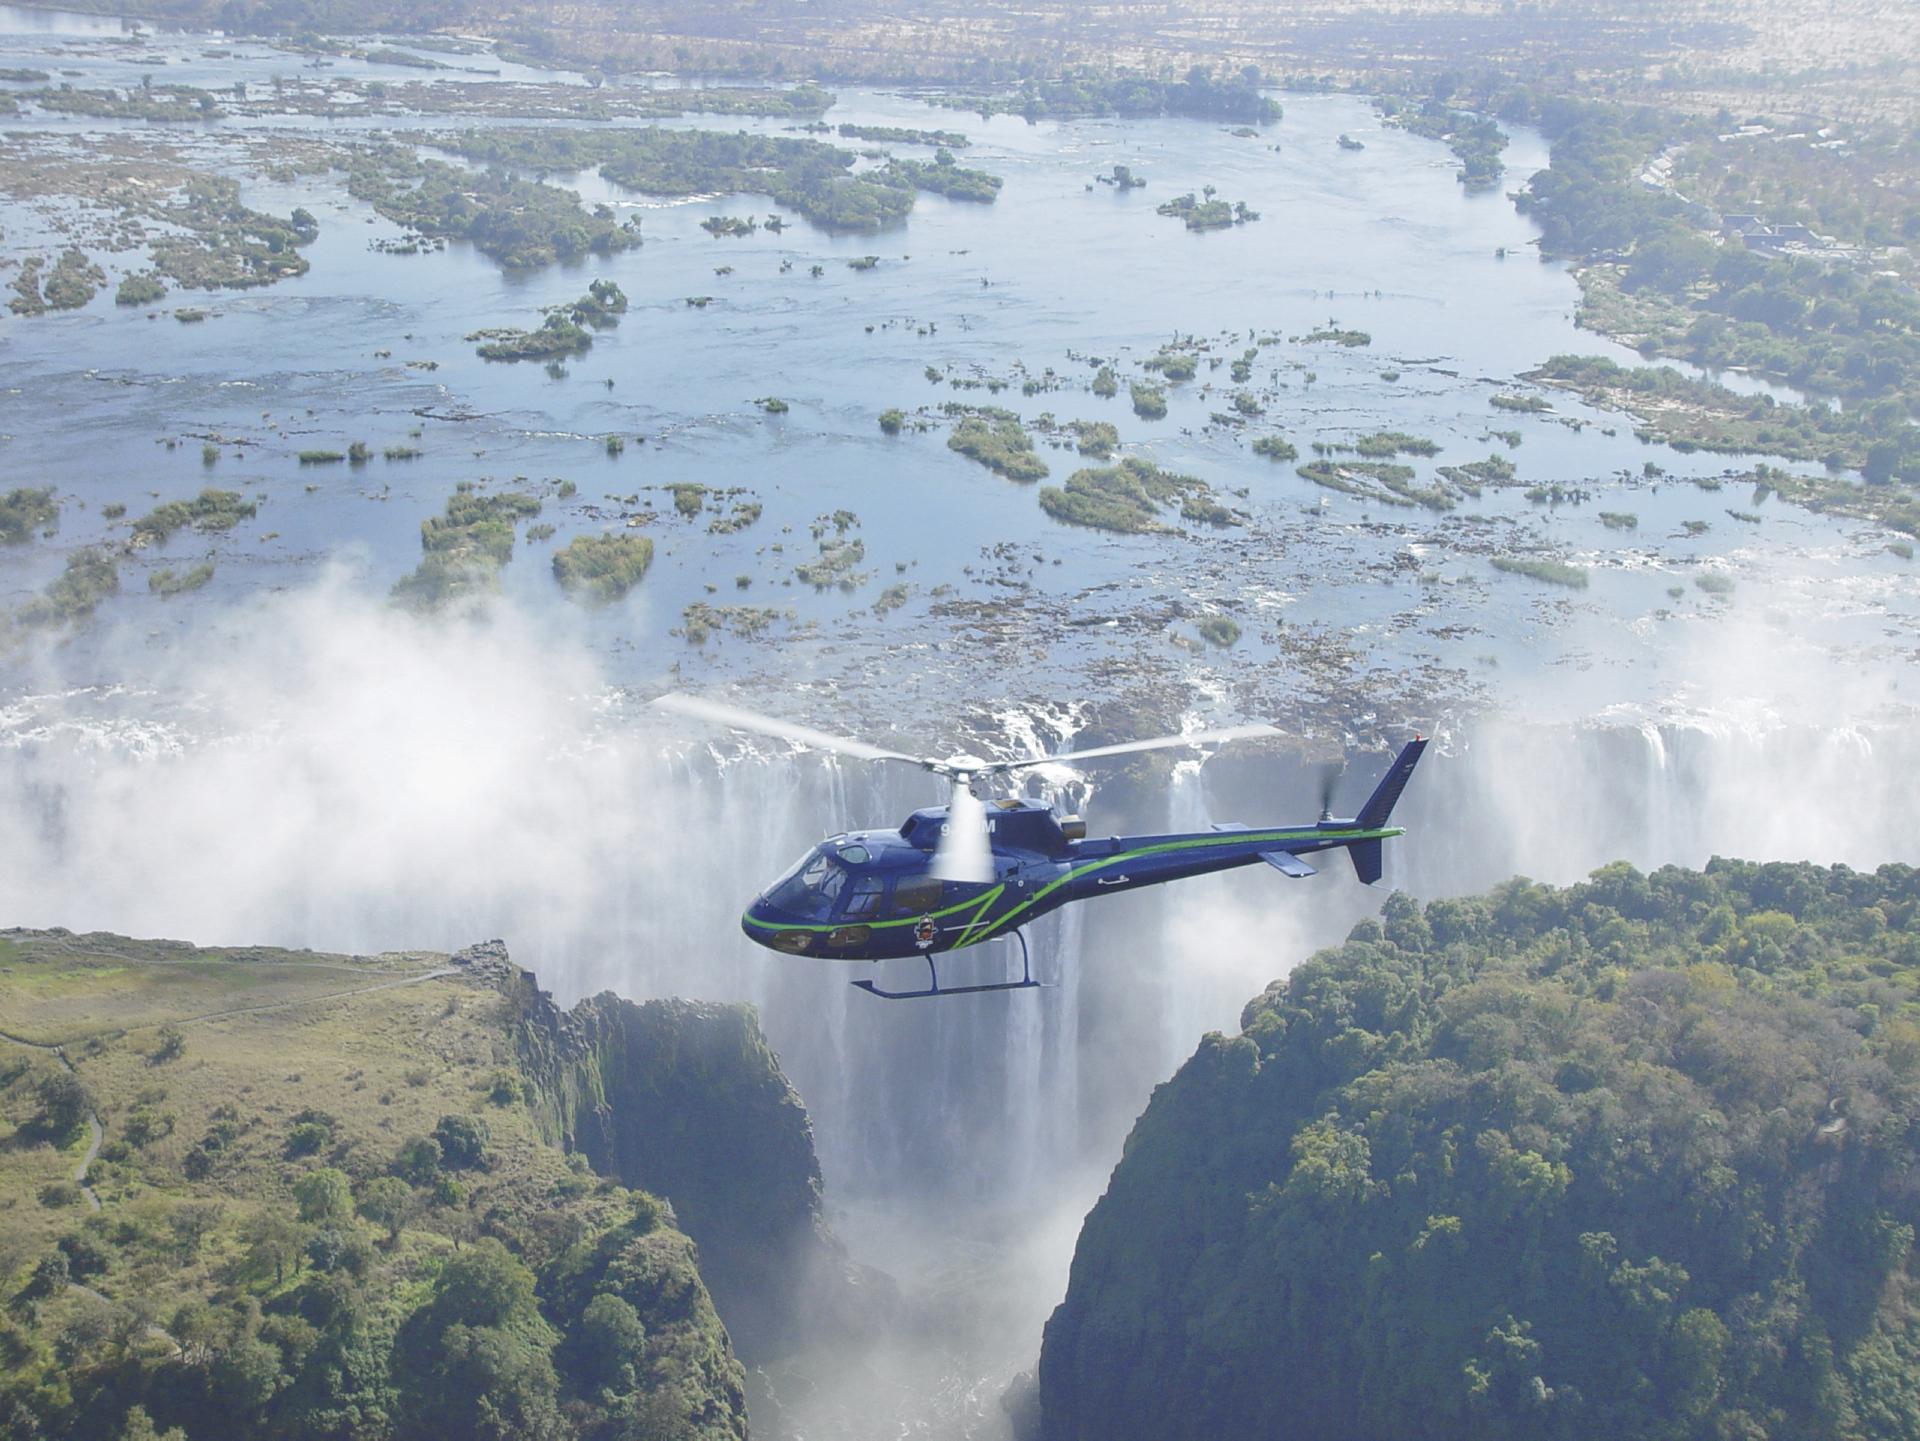 Helikopter Flug über die Victoria Wasserfälle